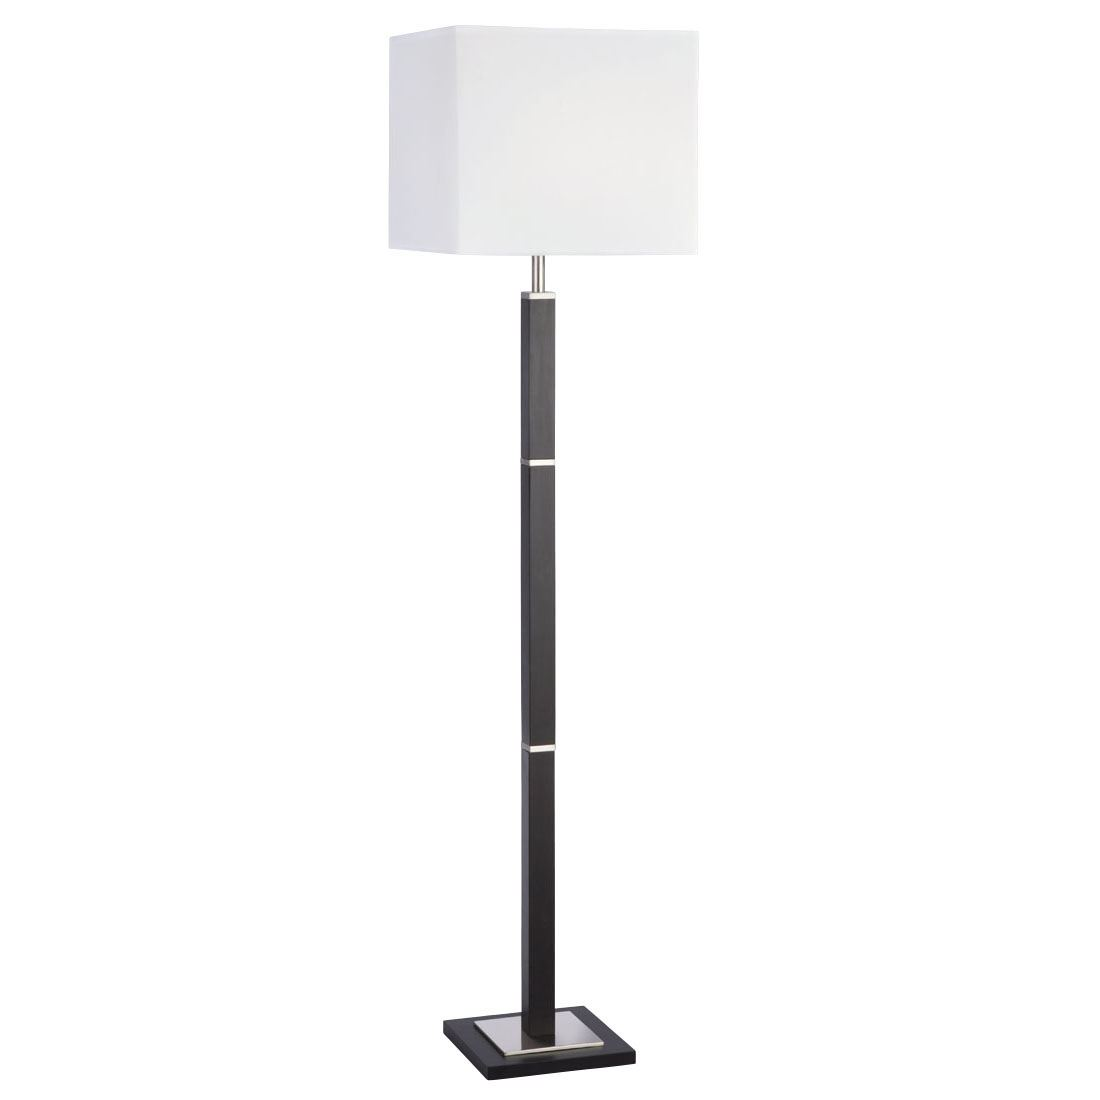 Waverley Table & Floor Lamp 1 Light Brown Wood/Satin Silver Rectangular